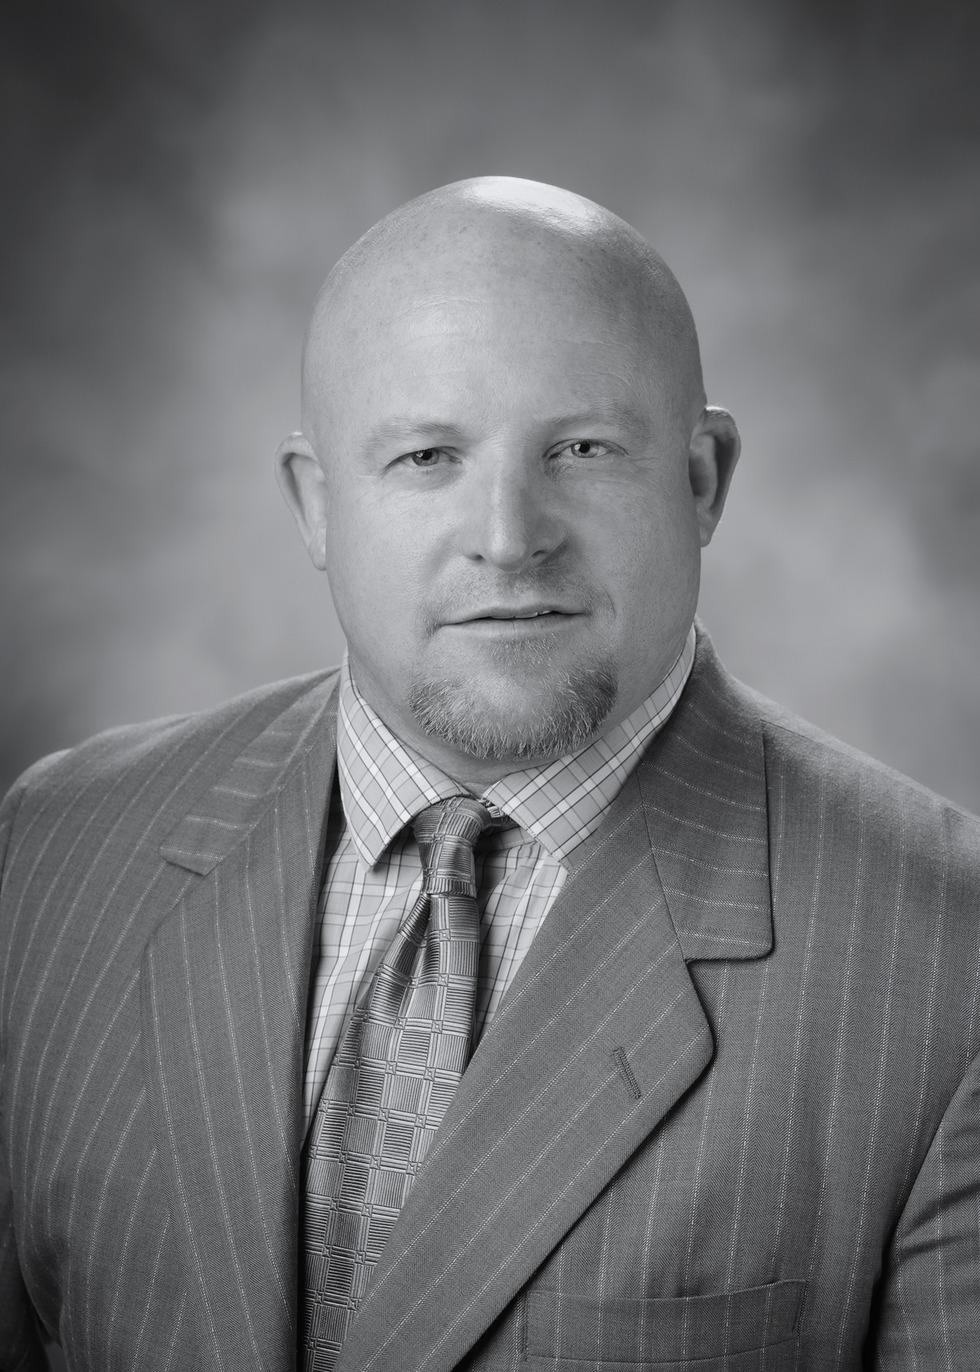 Fresno Criminal Defense Attorney Jonathan Eaton Rooker